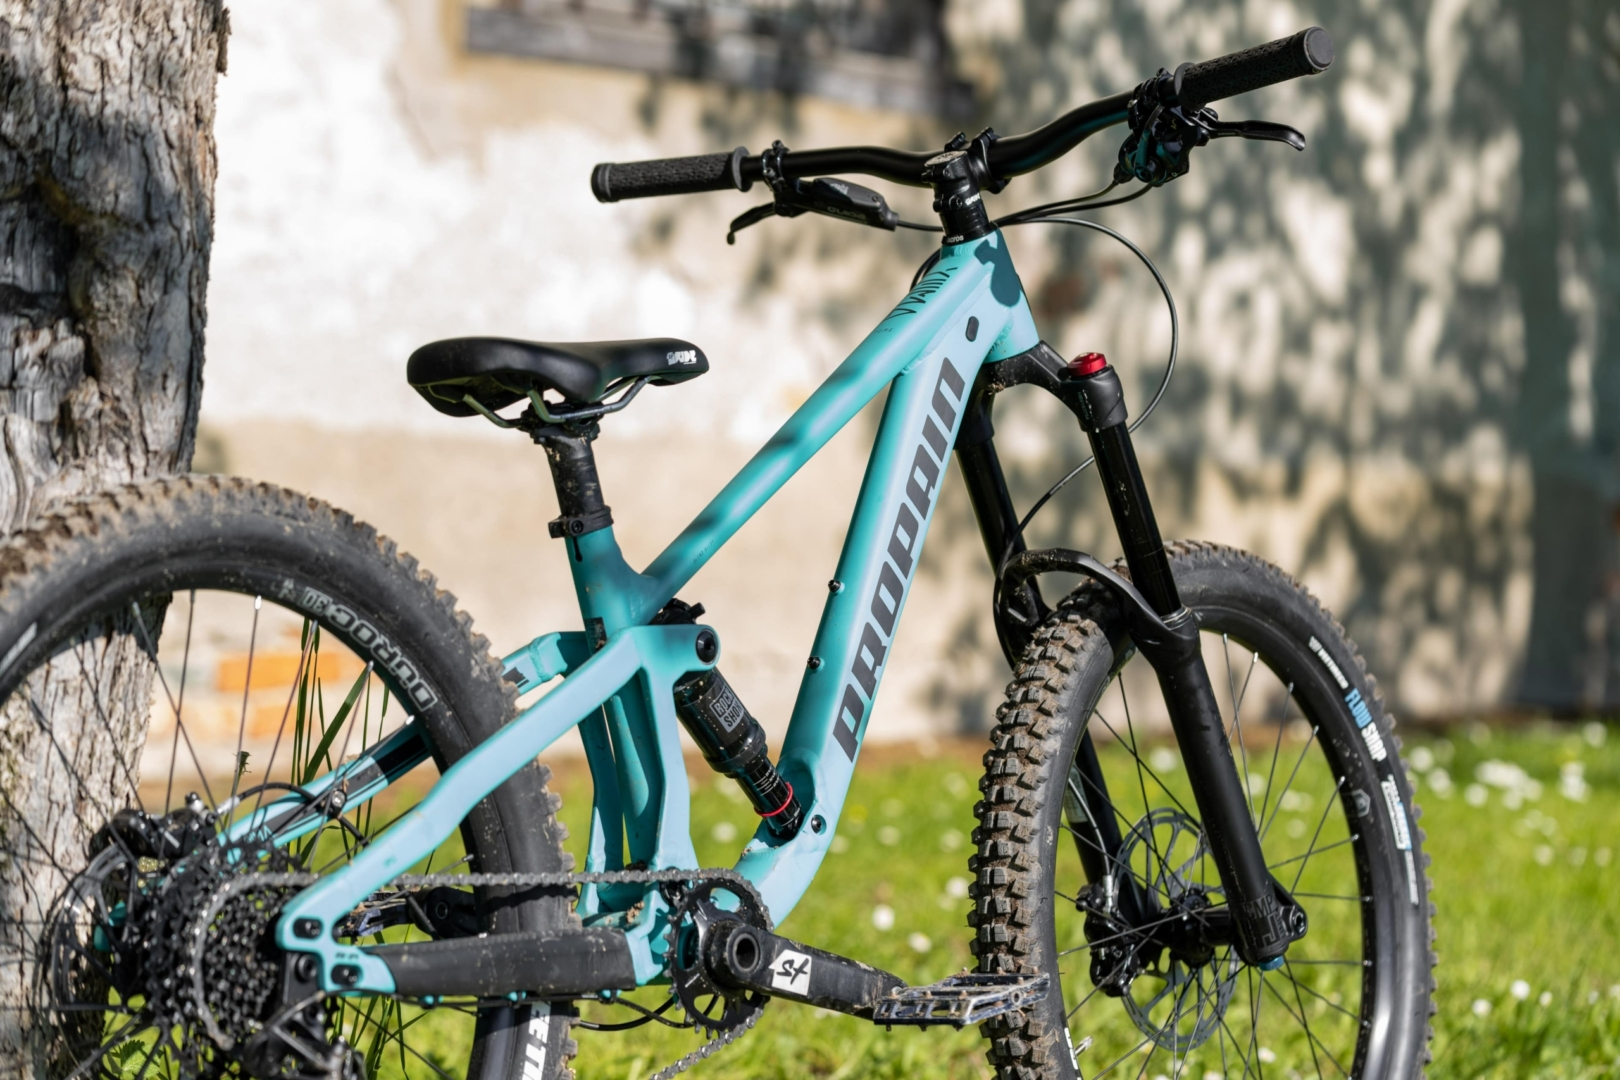 PROPAIN-Yuma-MY21-Weingarten-Bike-Still-badmint-Back-scaled.jpg